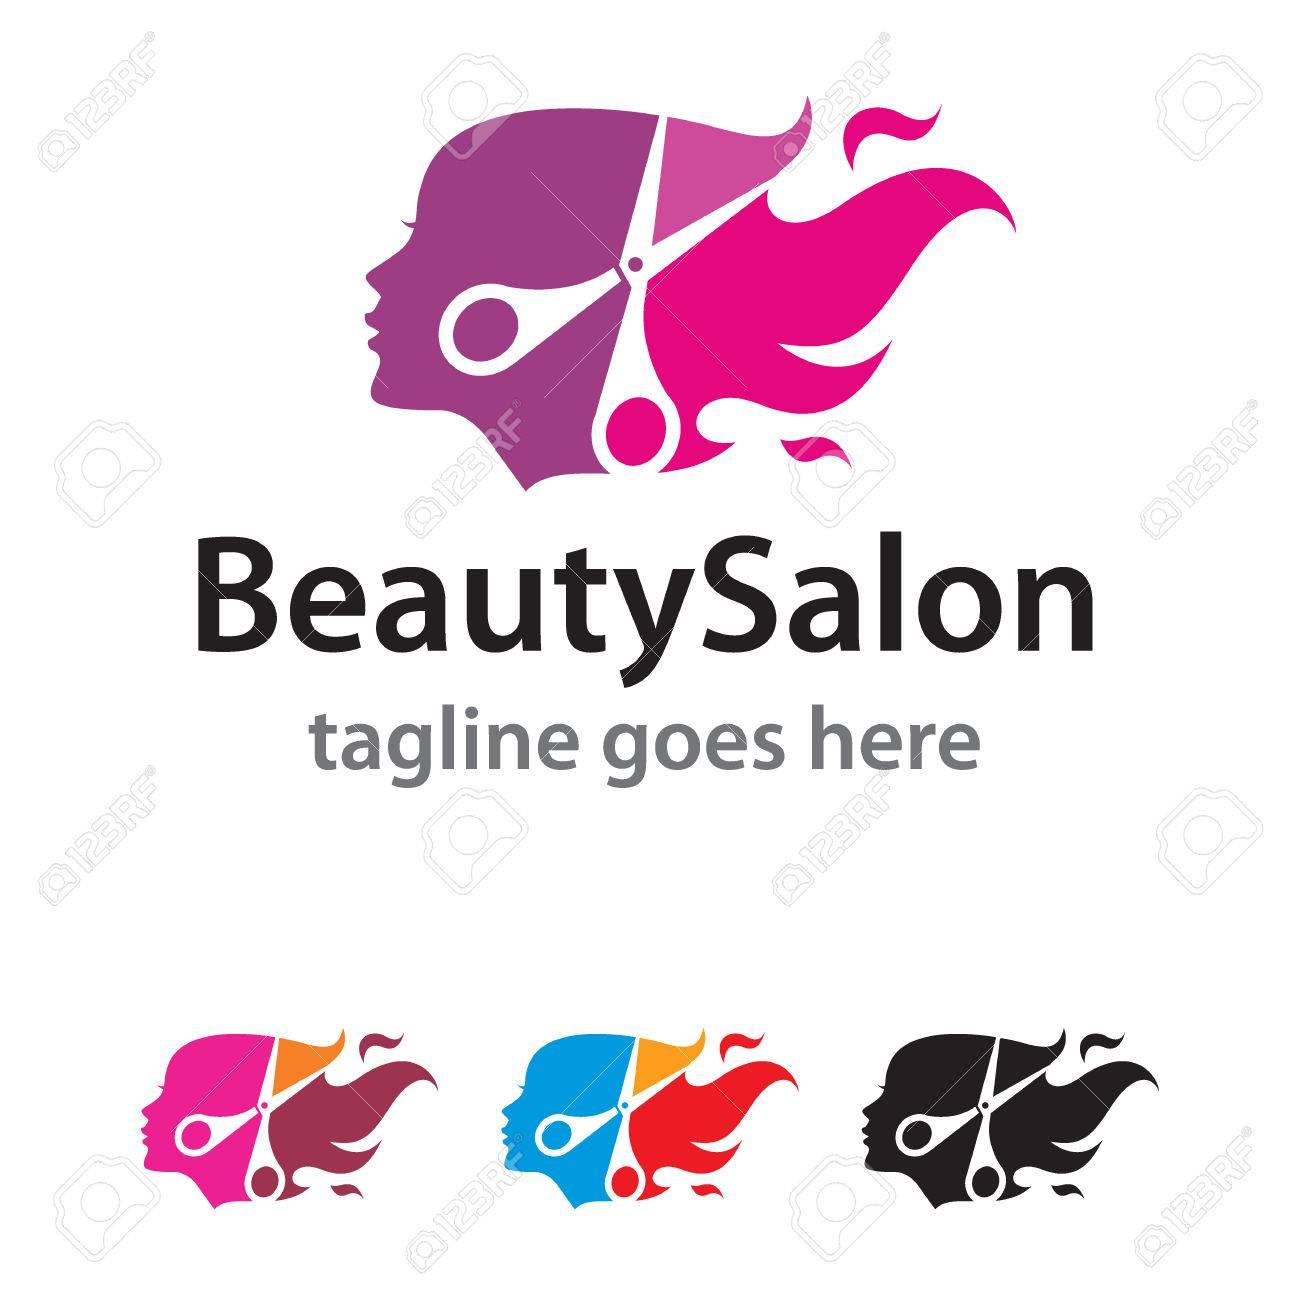 Beauty salon logo template design vector royalty free cliparts beauty salon logo template design vector stock vector 68563479 altavistaventures Images